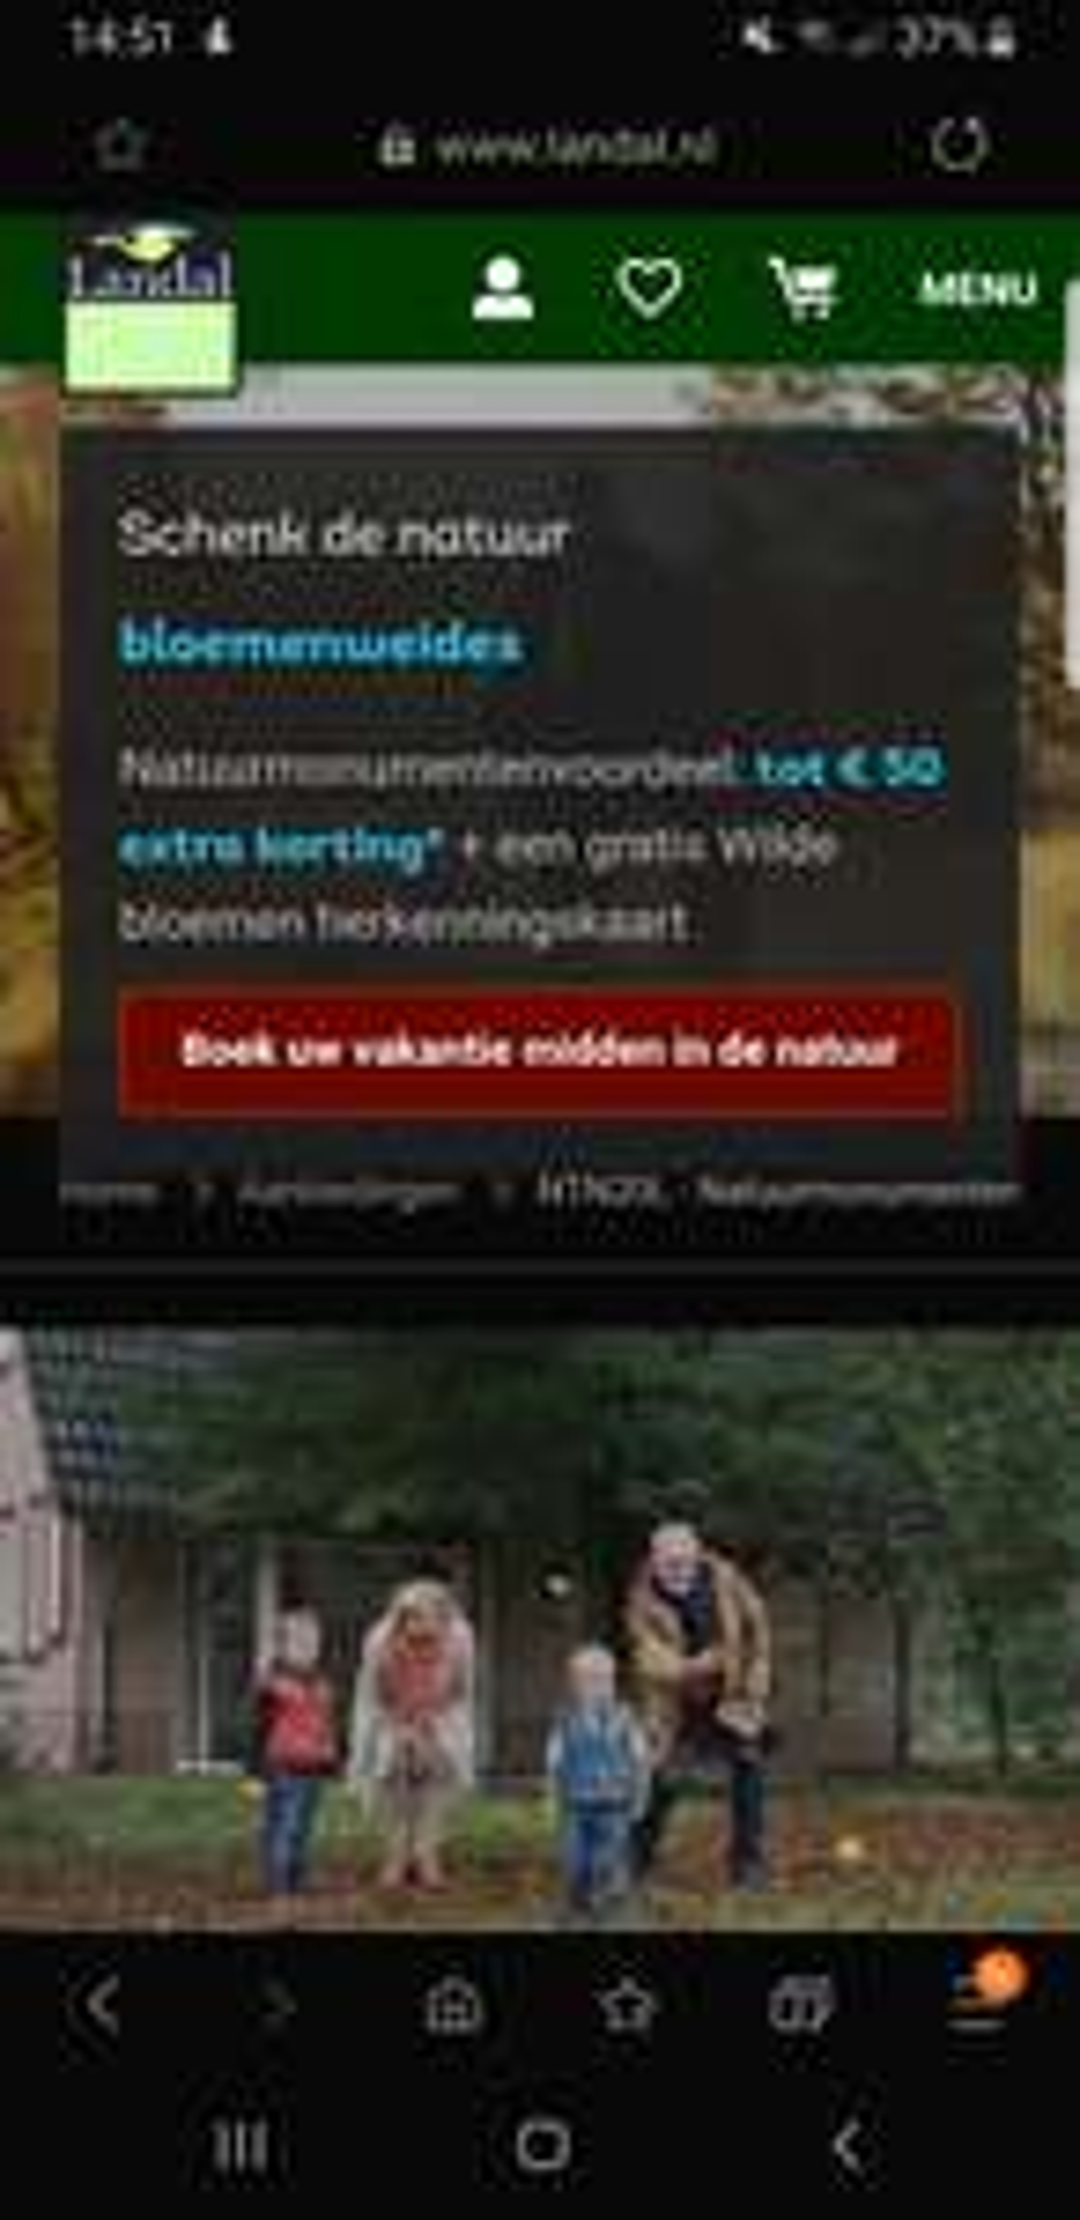 Tot 50€ extra korting Landal + gratis wilde bloemen herkenningskaart